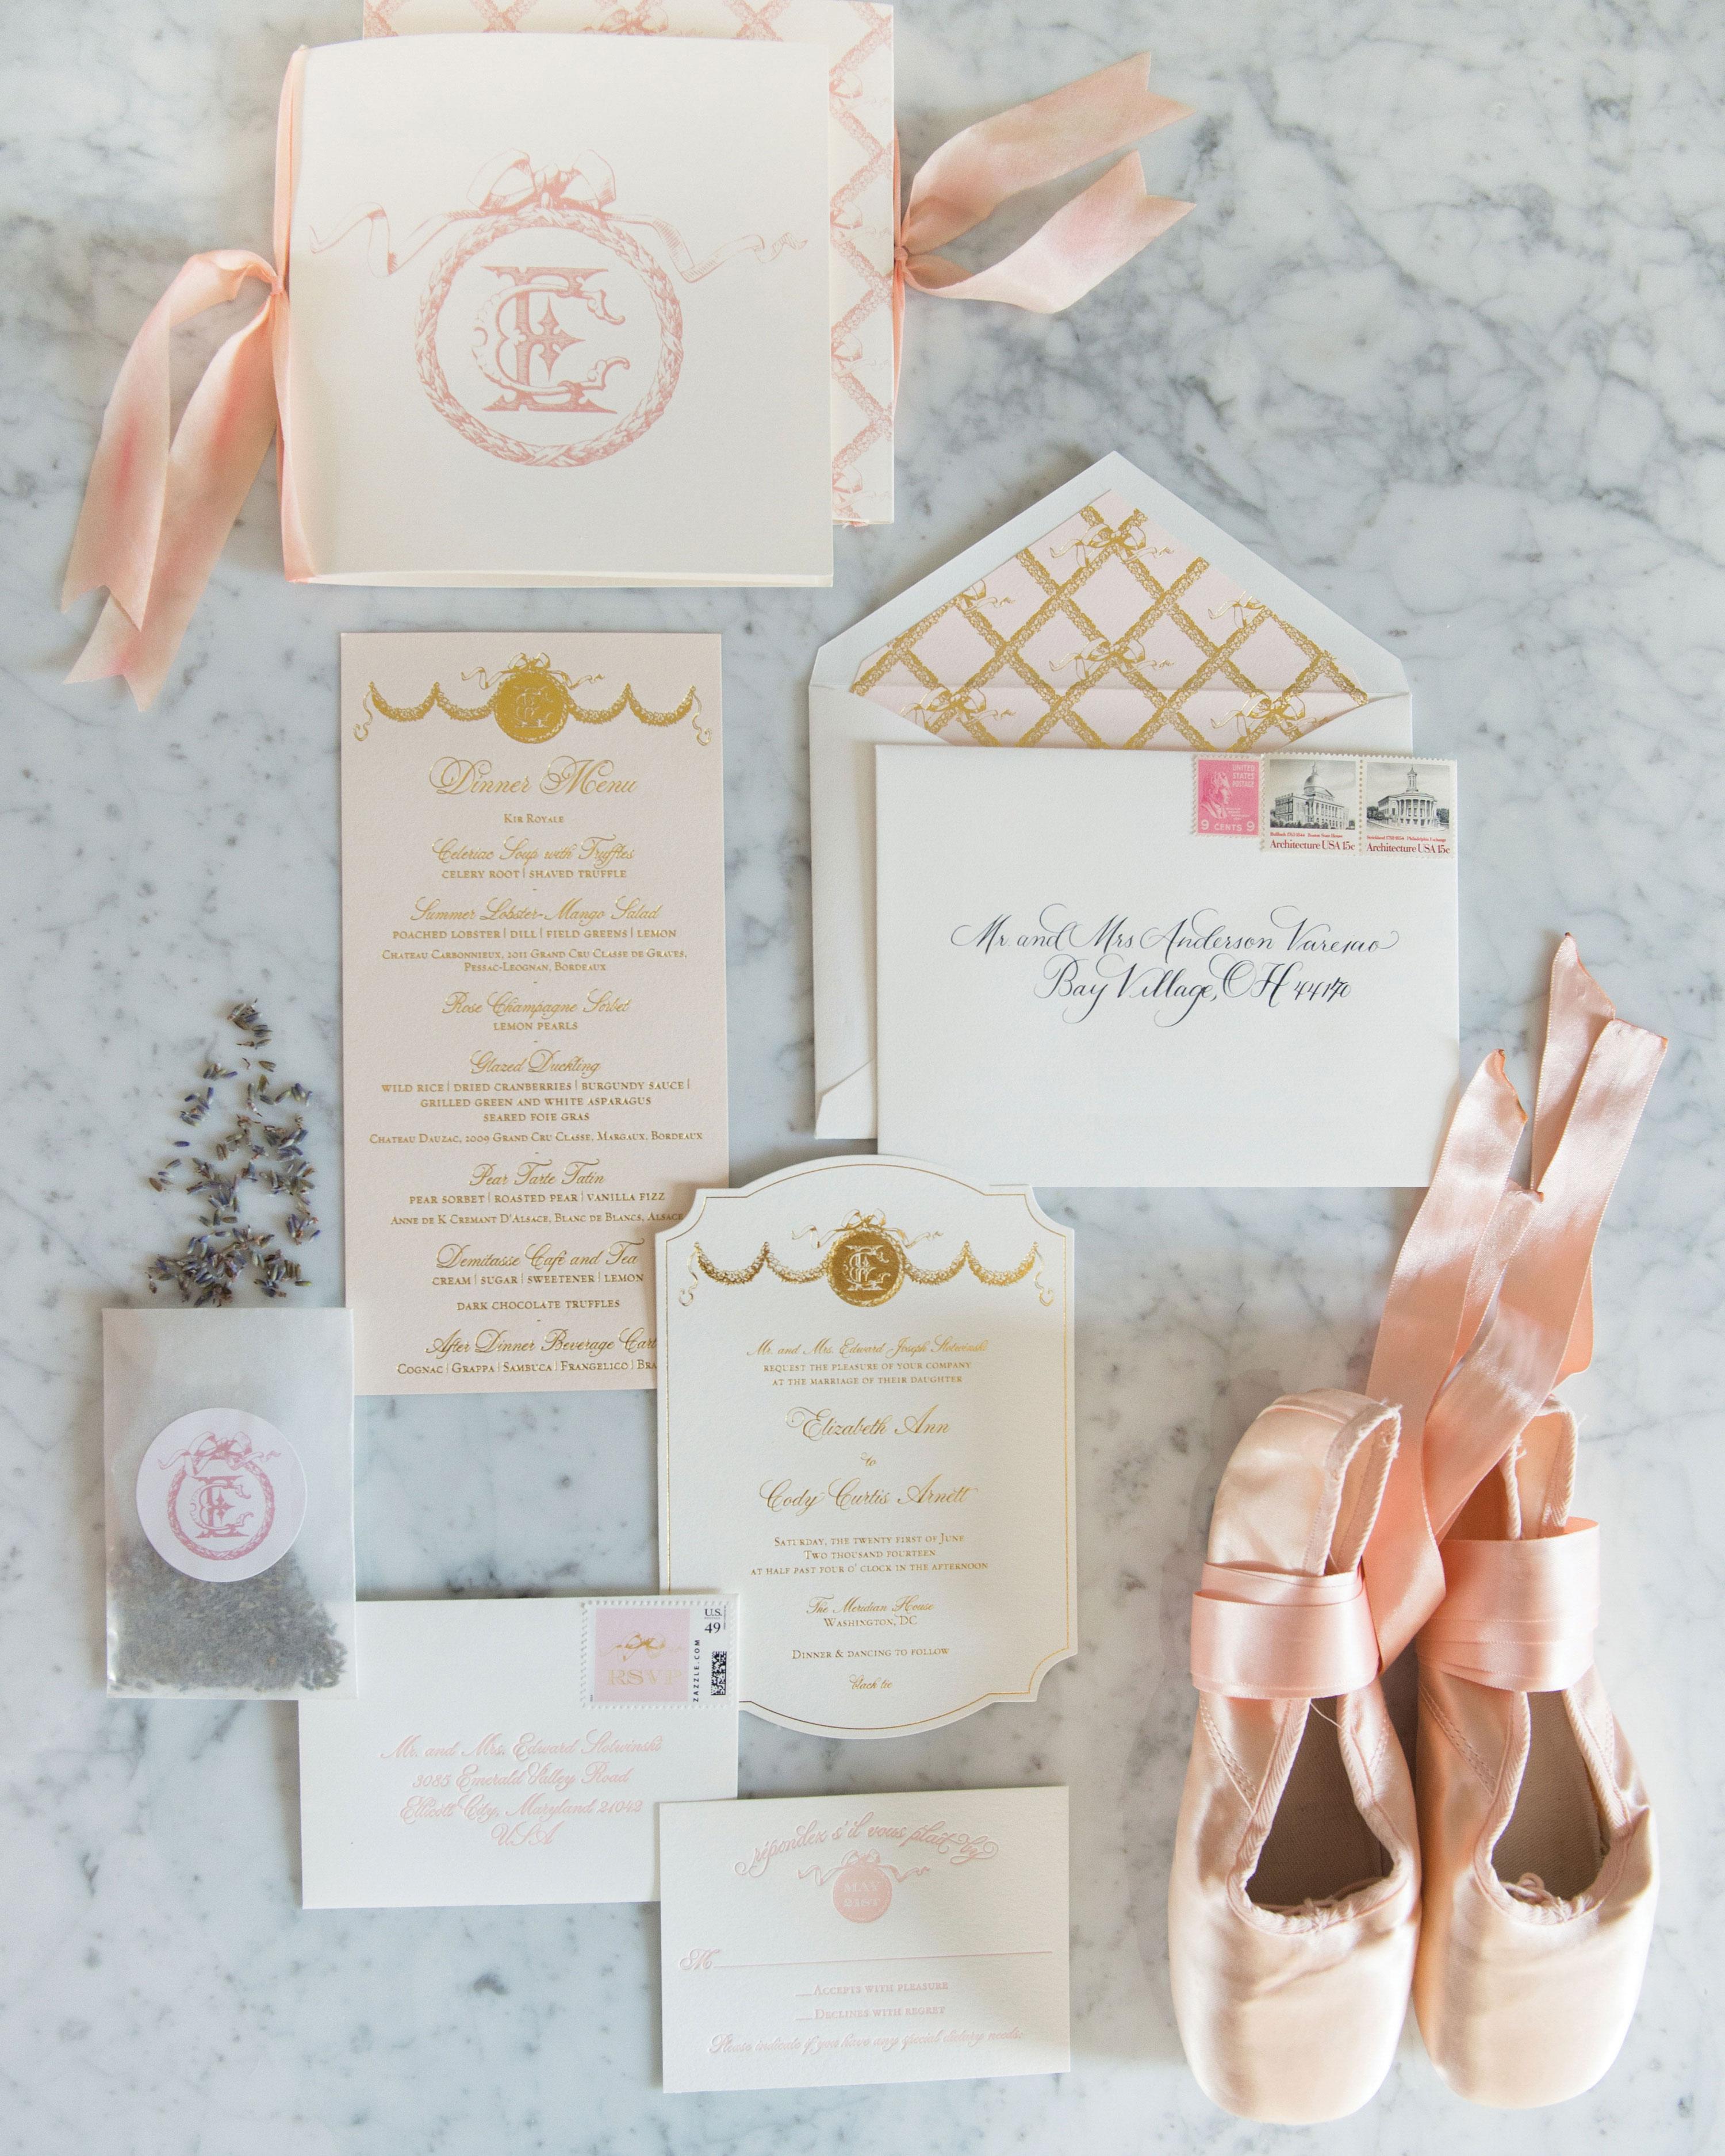 elizabeth-cody-real-wedding-invitations-parisian-theme.jpg